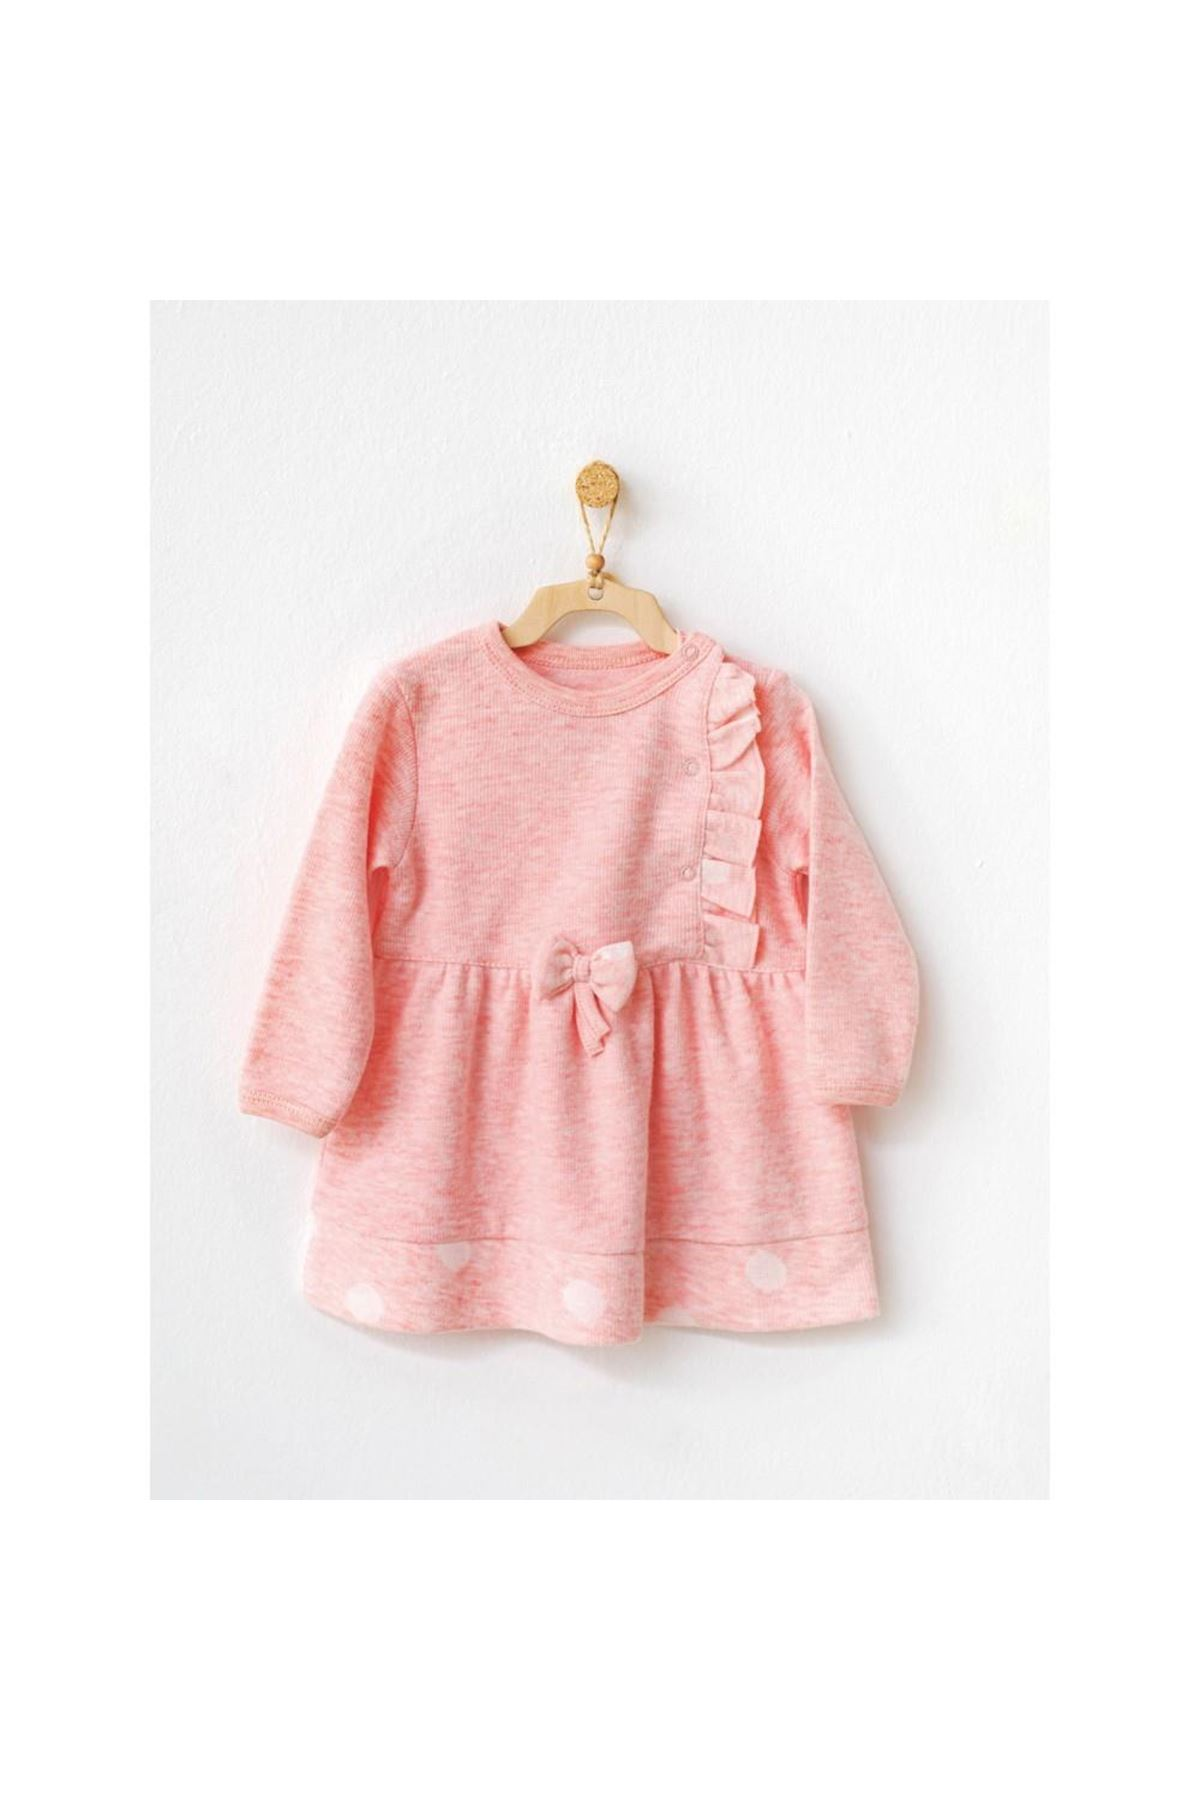 Andywawa AC21138 Polka Dot Bebek Elbise Pink